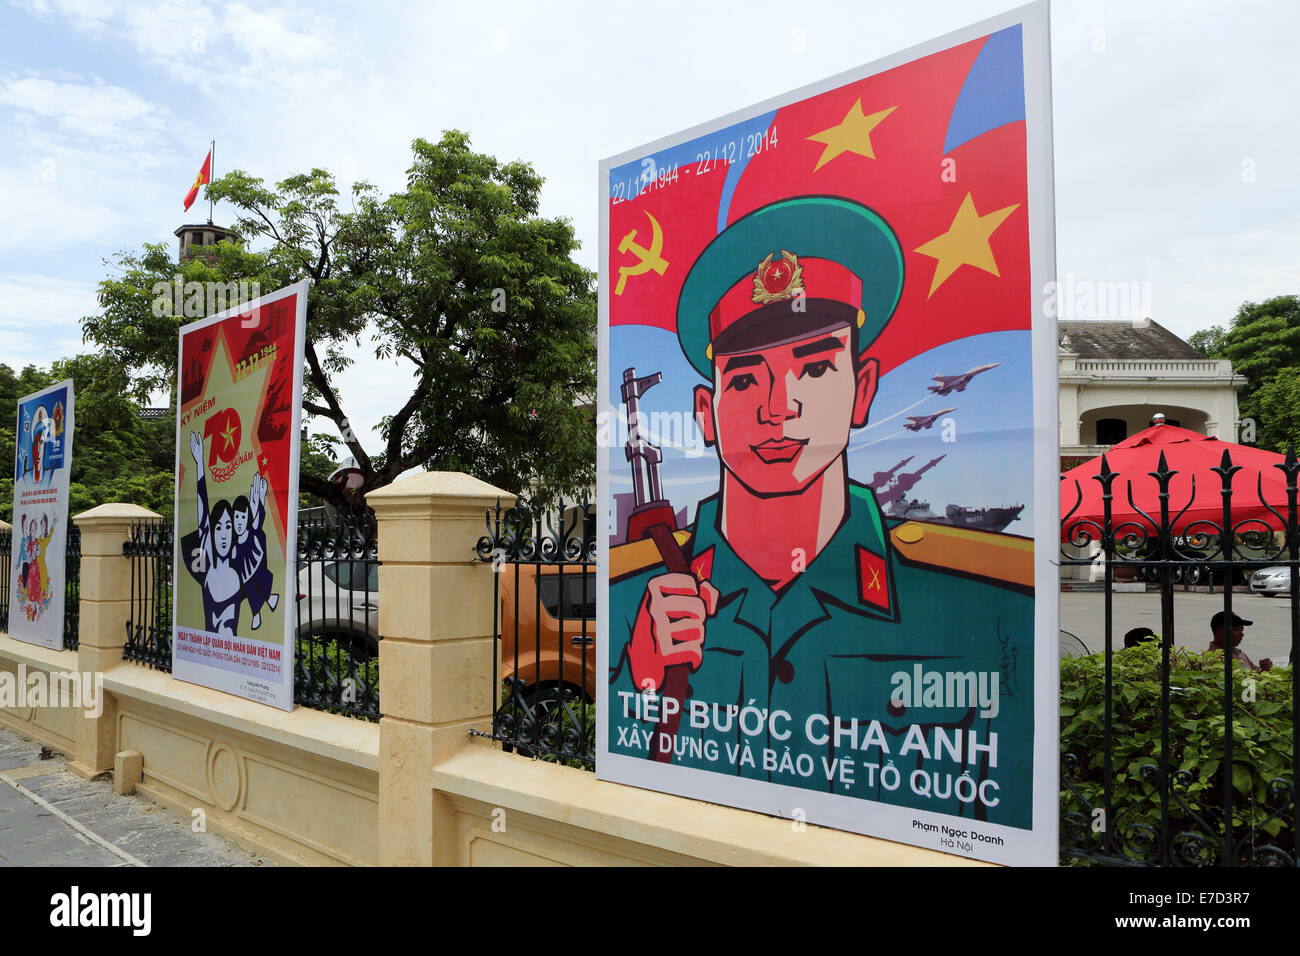 Propaganda posters outside of the Vietnam Military History Museum in Hanoi, Vietnam. - Stock Image